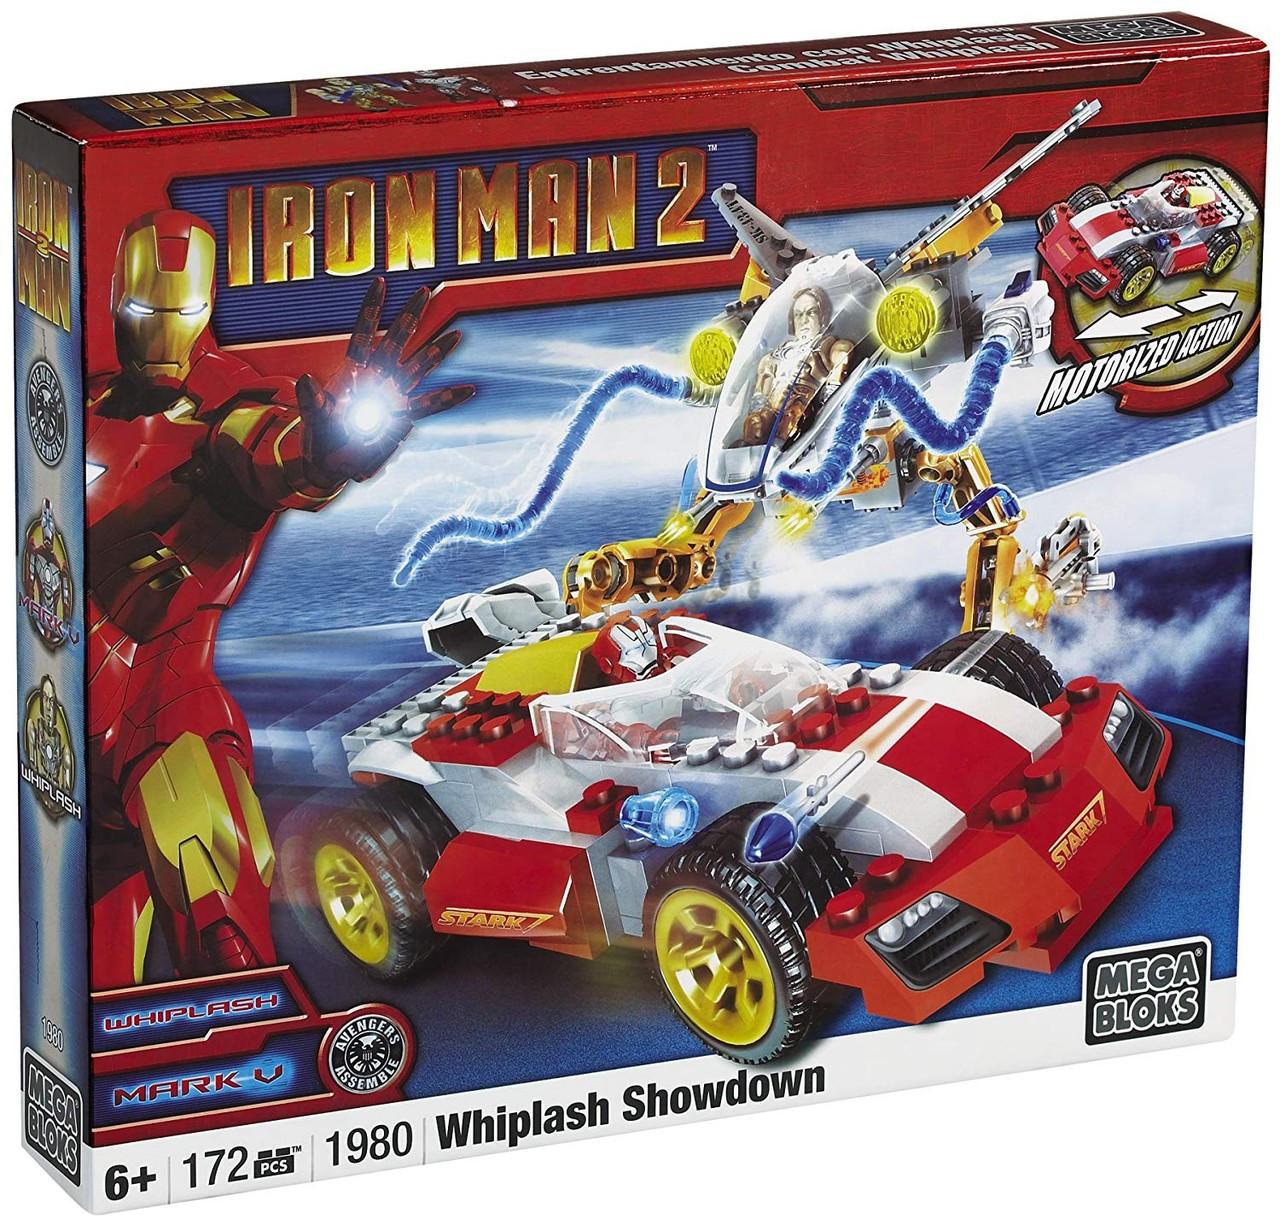 Mega Bloks Iron Man 2 Whiplash Showdown Set #1980